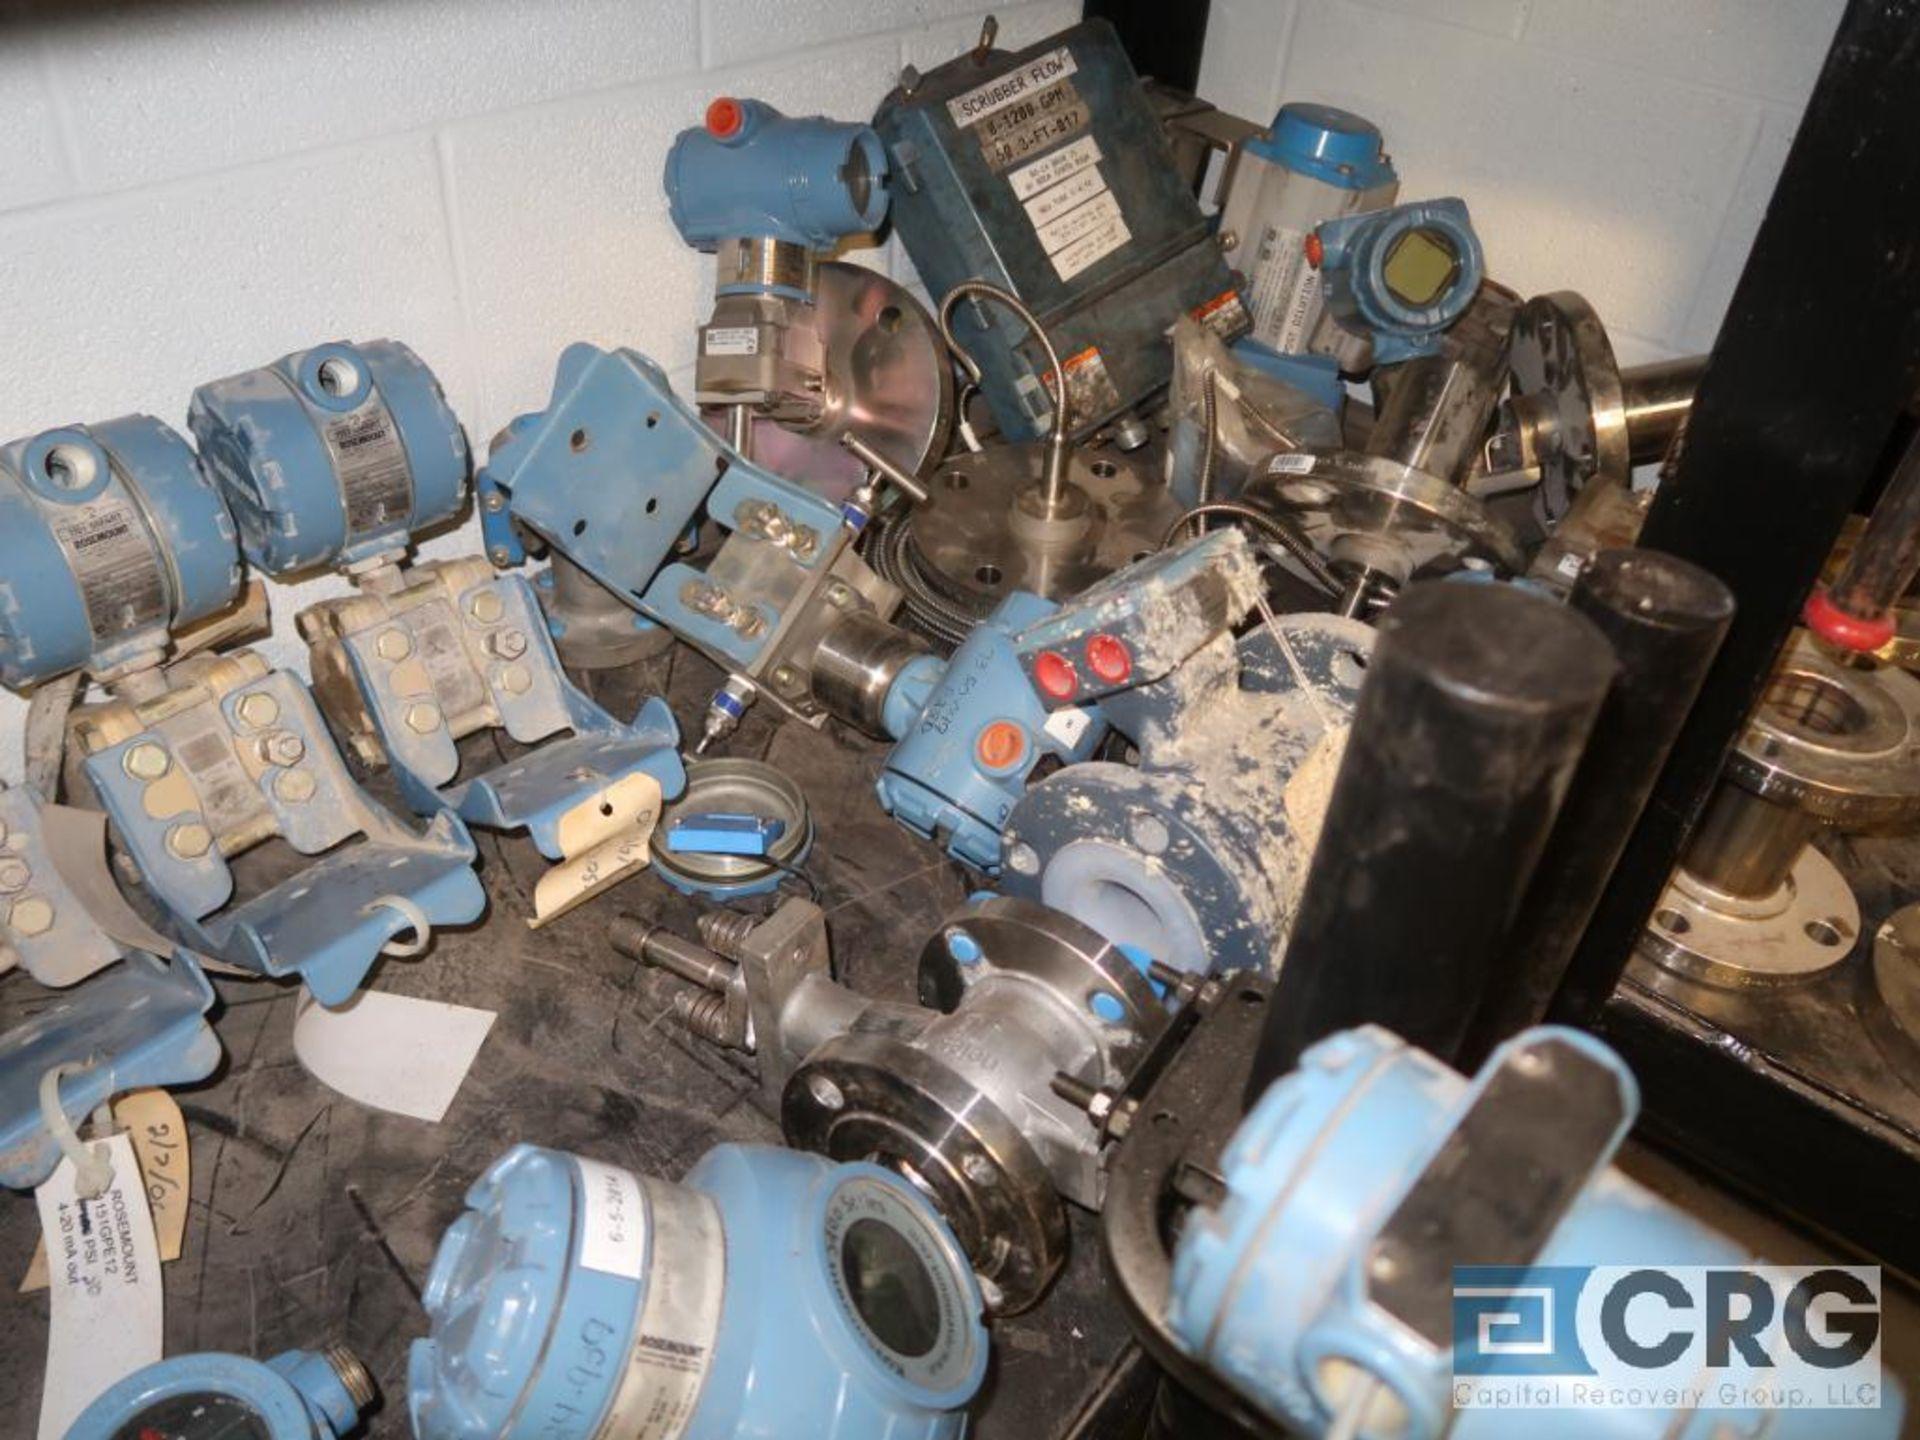 Lot of assorted Foxboro and Rosemont assorted sensors-on (1) shelf of rack (Inside Shop-496 Dock - Image 2 of 2